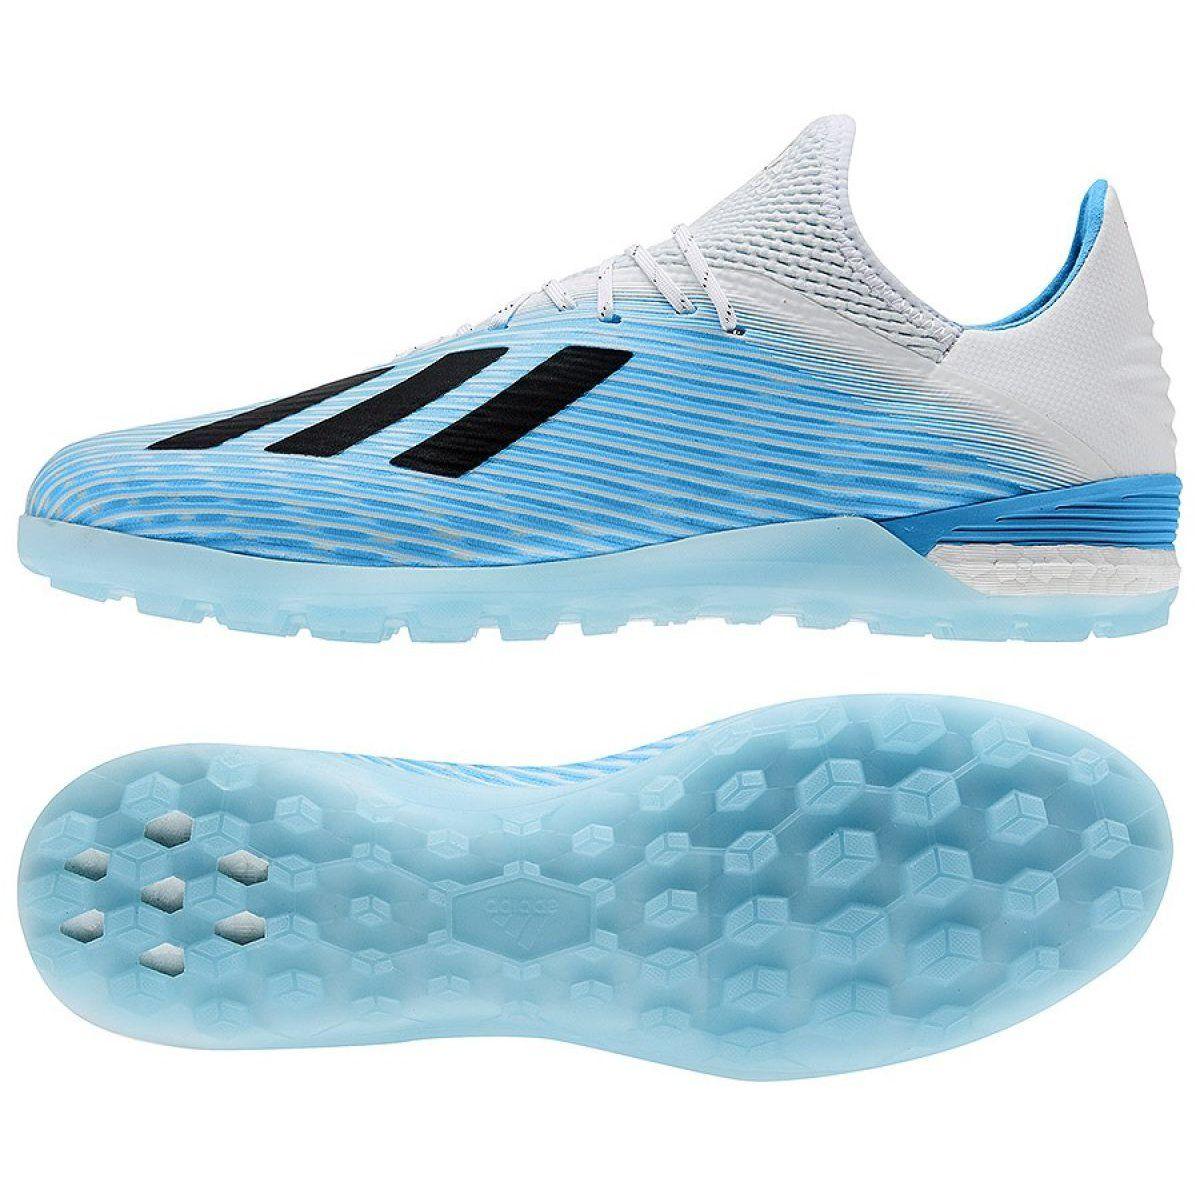 Buty Pilkarskie Adidas X 19 1 Tf M F99999 Niebieskie Biale Football Shoes Blue Shoes Adidas Football